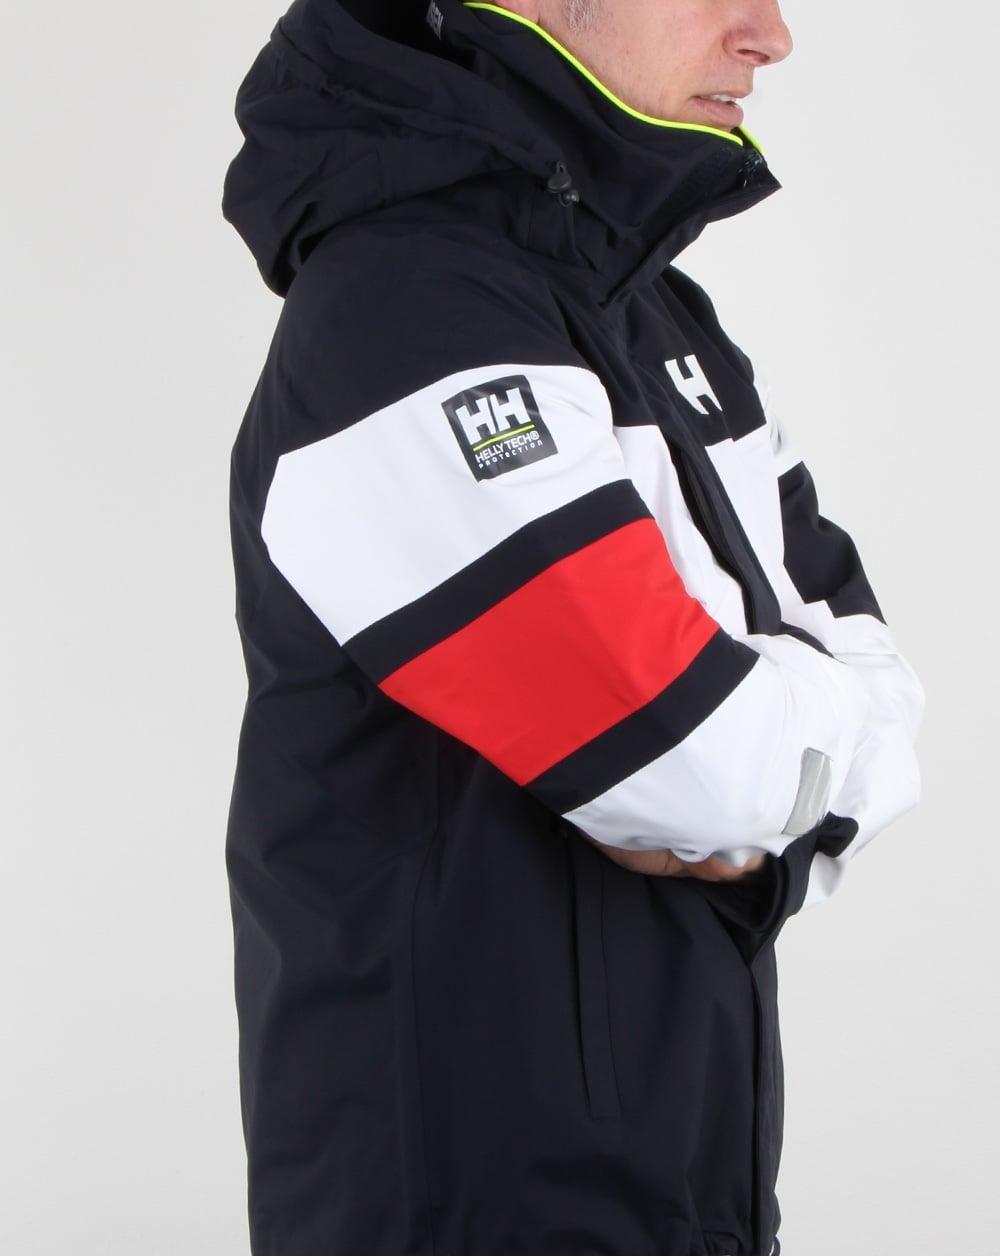 mode rabattkod utloppsbutik Helly Hansen Salt Light Jacket Navy, Mens,Jacket,Waterproof,Helly Tech